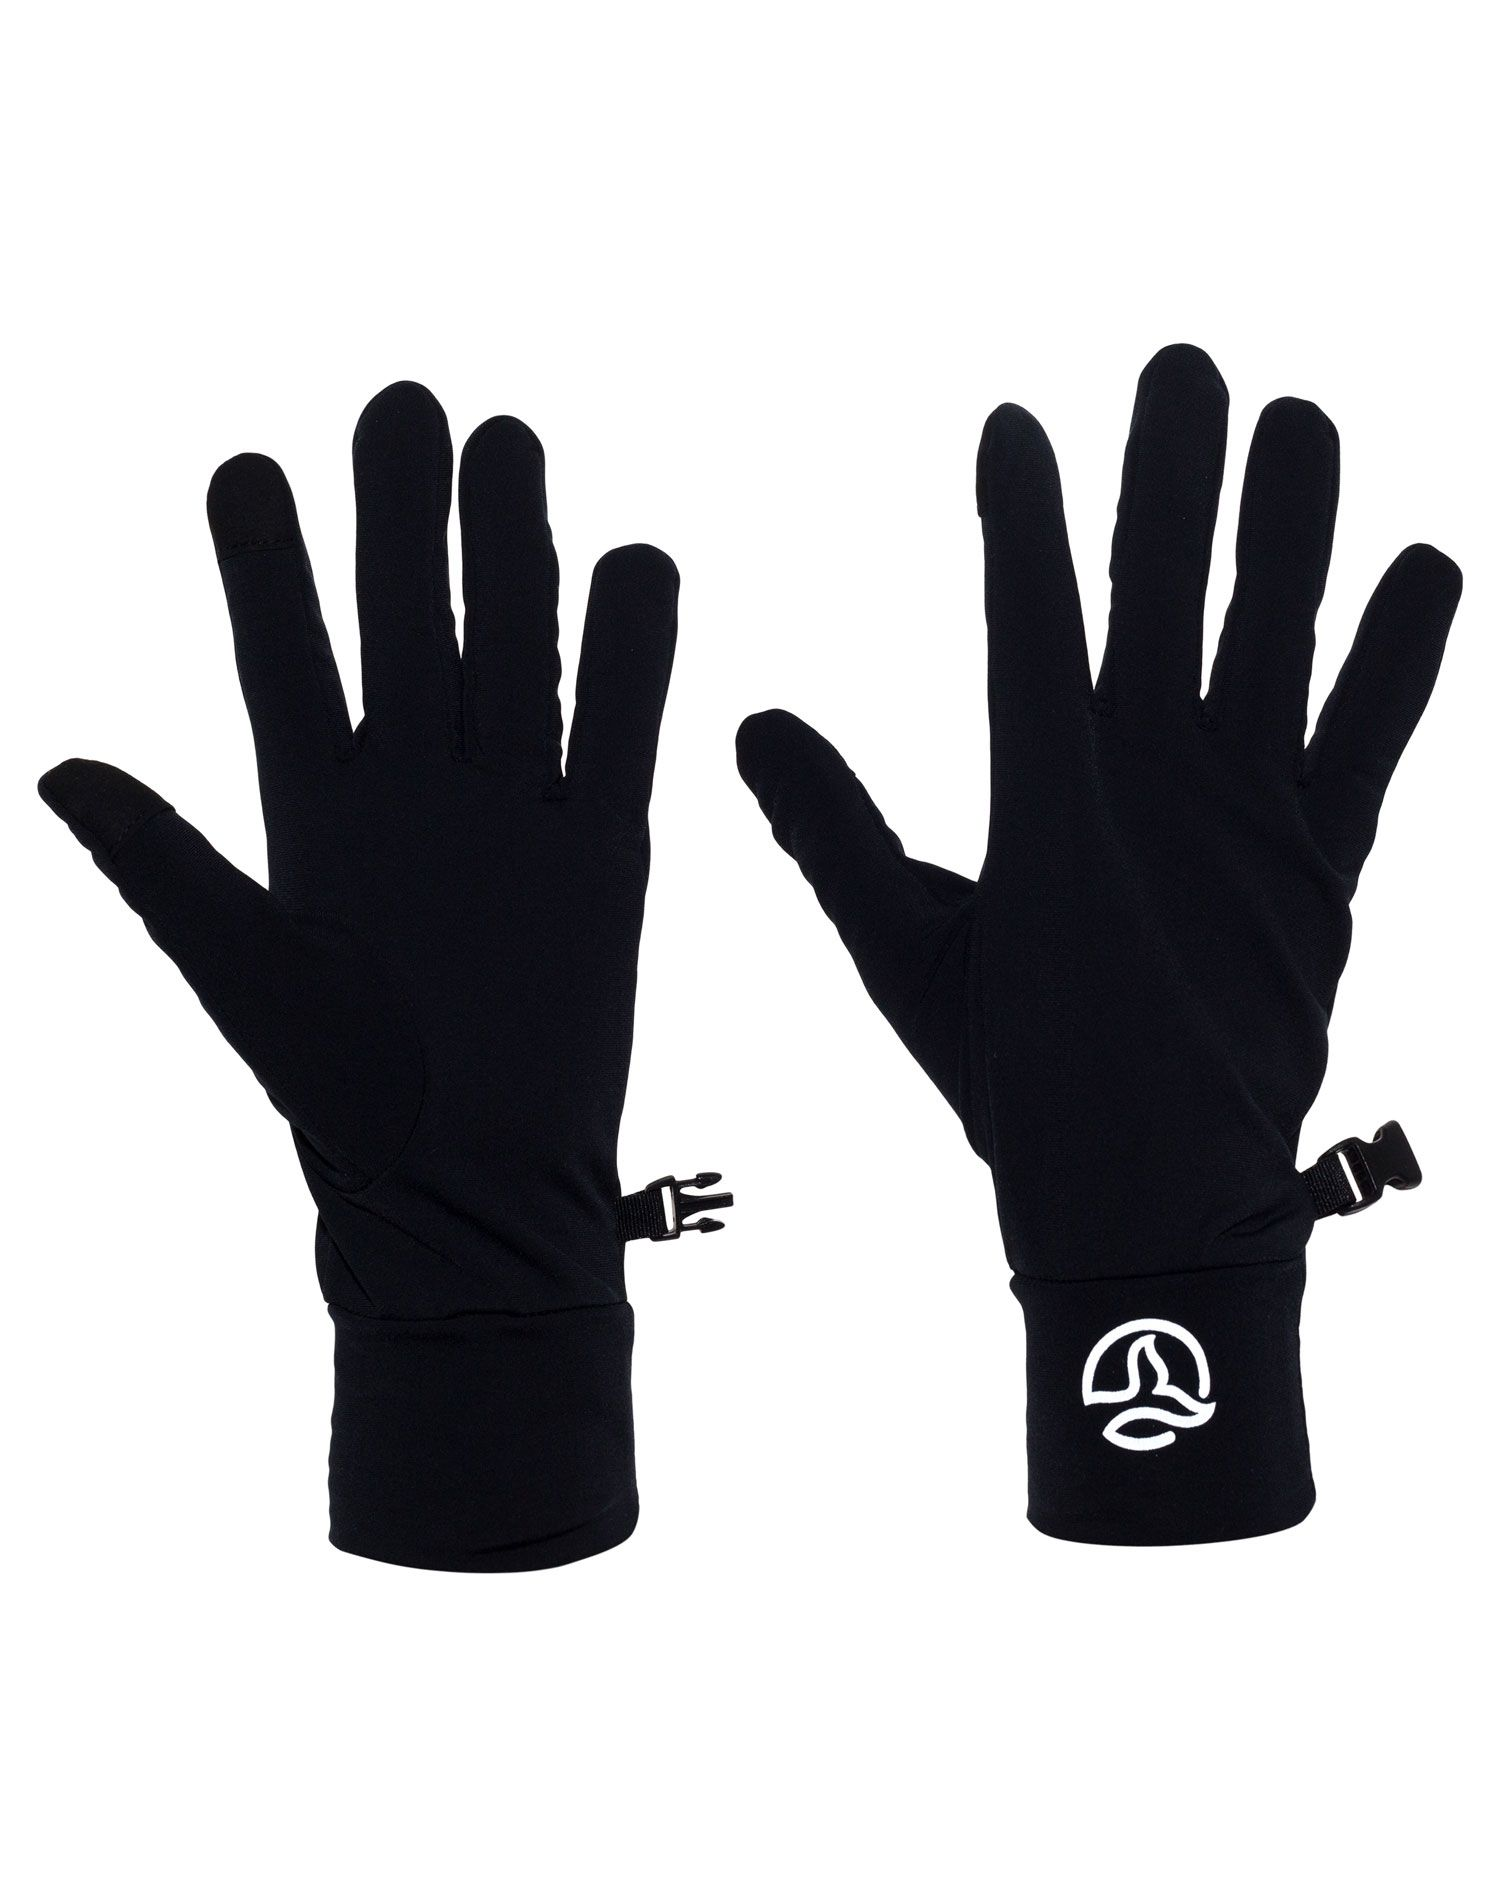 Ternua Avanti Glove